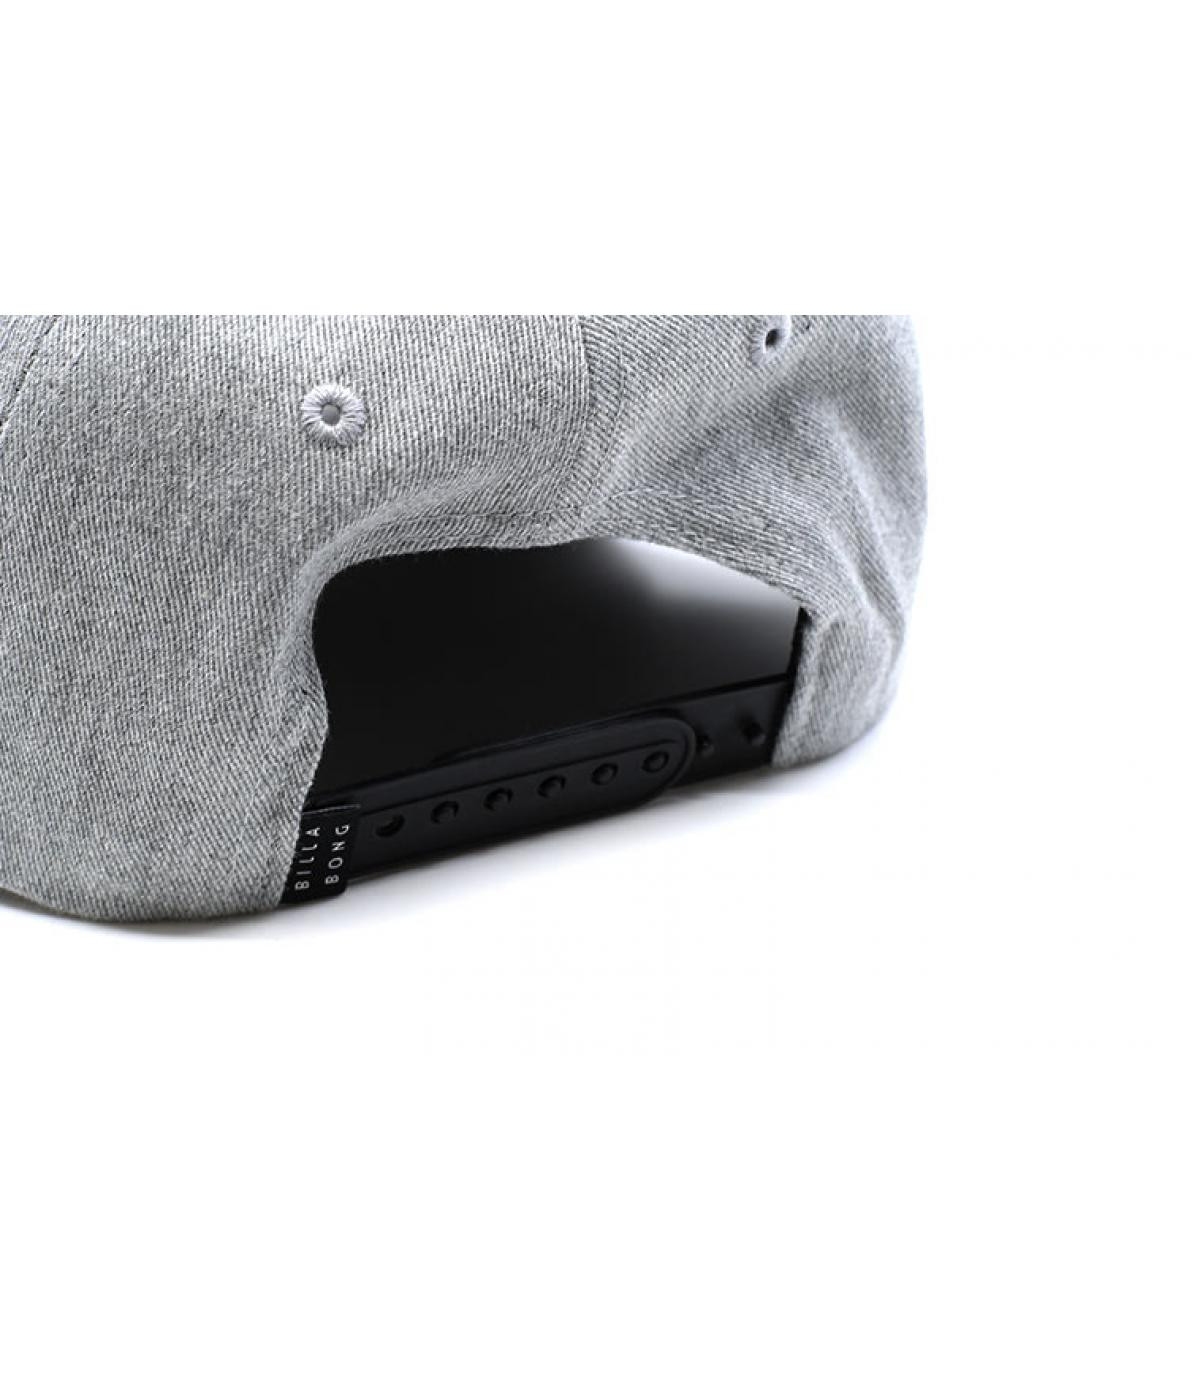 Dettagli Walled Snapback Boys grey heather - image 5